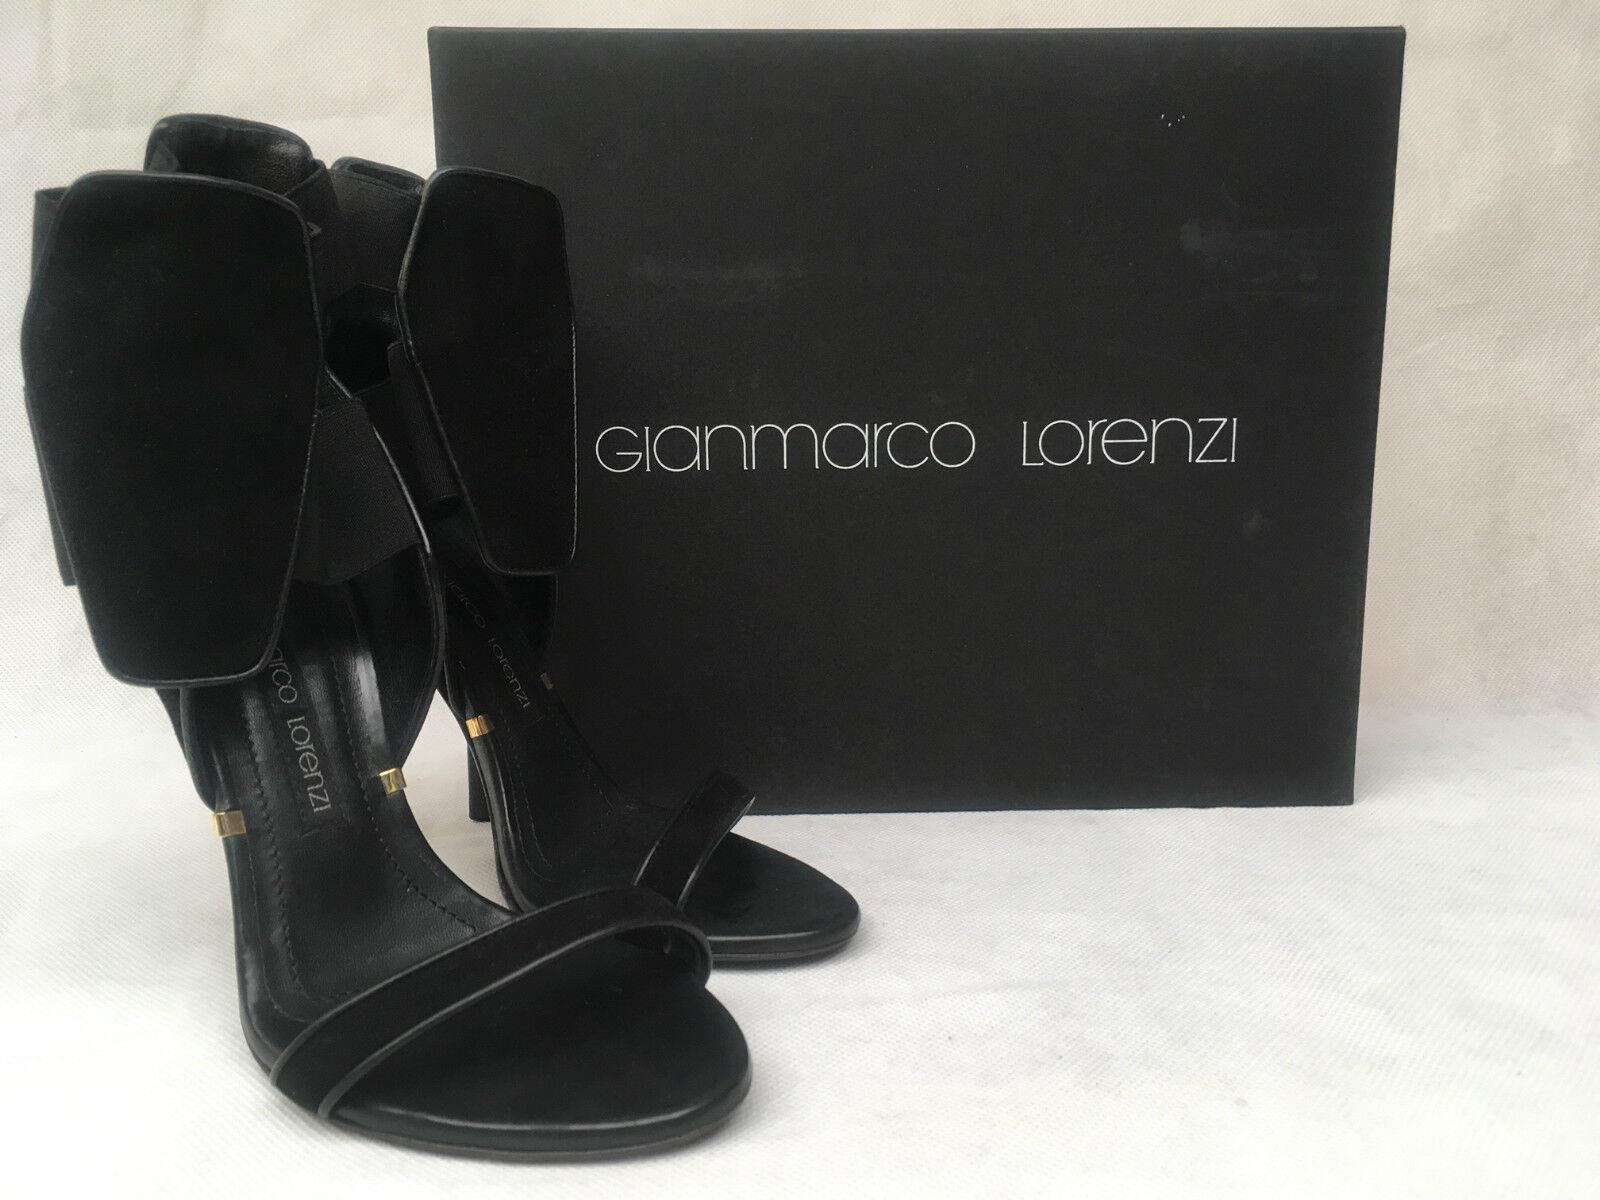 Gianmarco Lorenzi Leather Black Heels. P5D6F0023. Various Sizes.